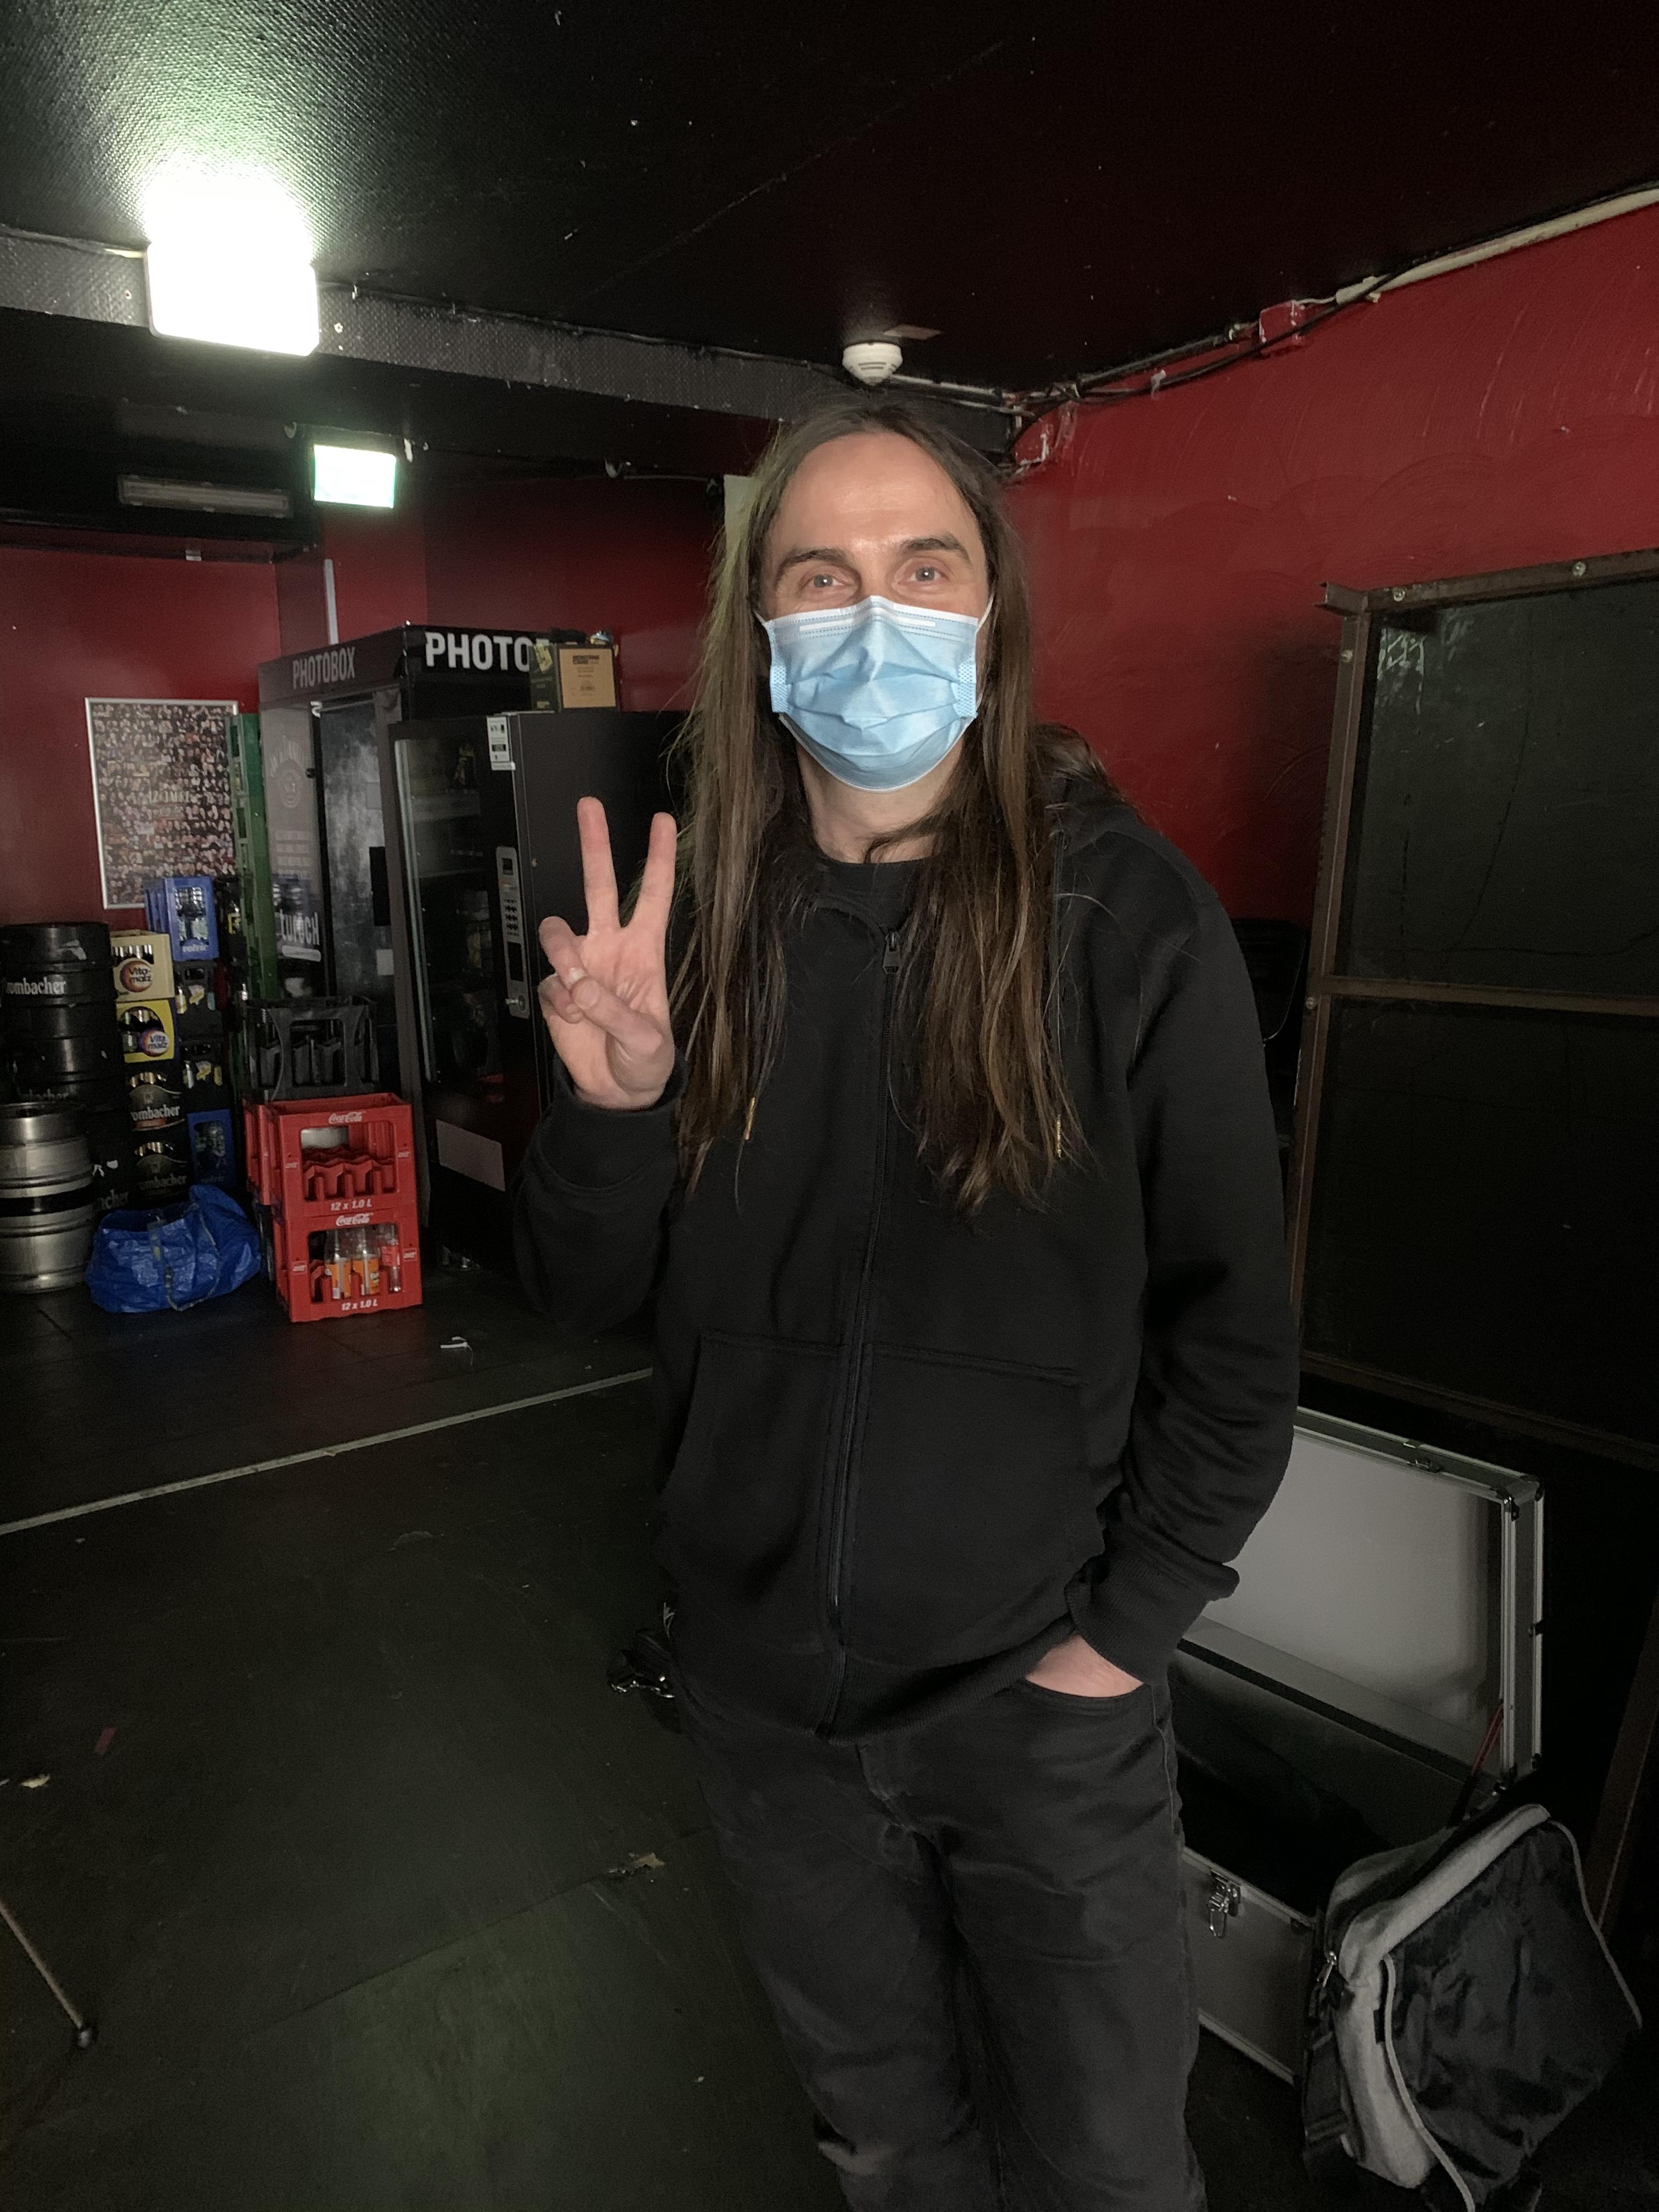 The-Very-End-Metal-Video-Shoot-behind-the-scenes_5442